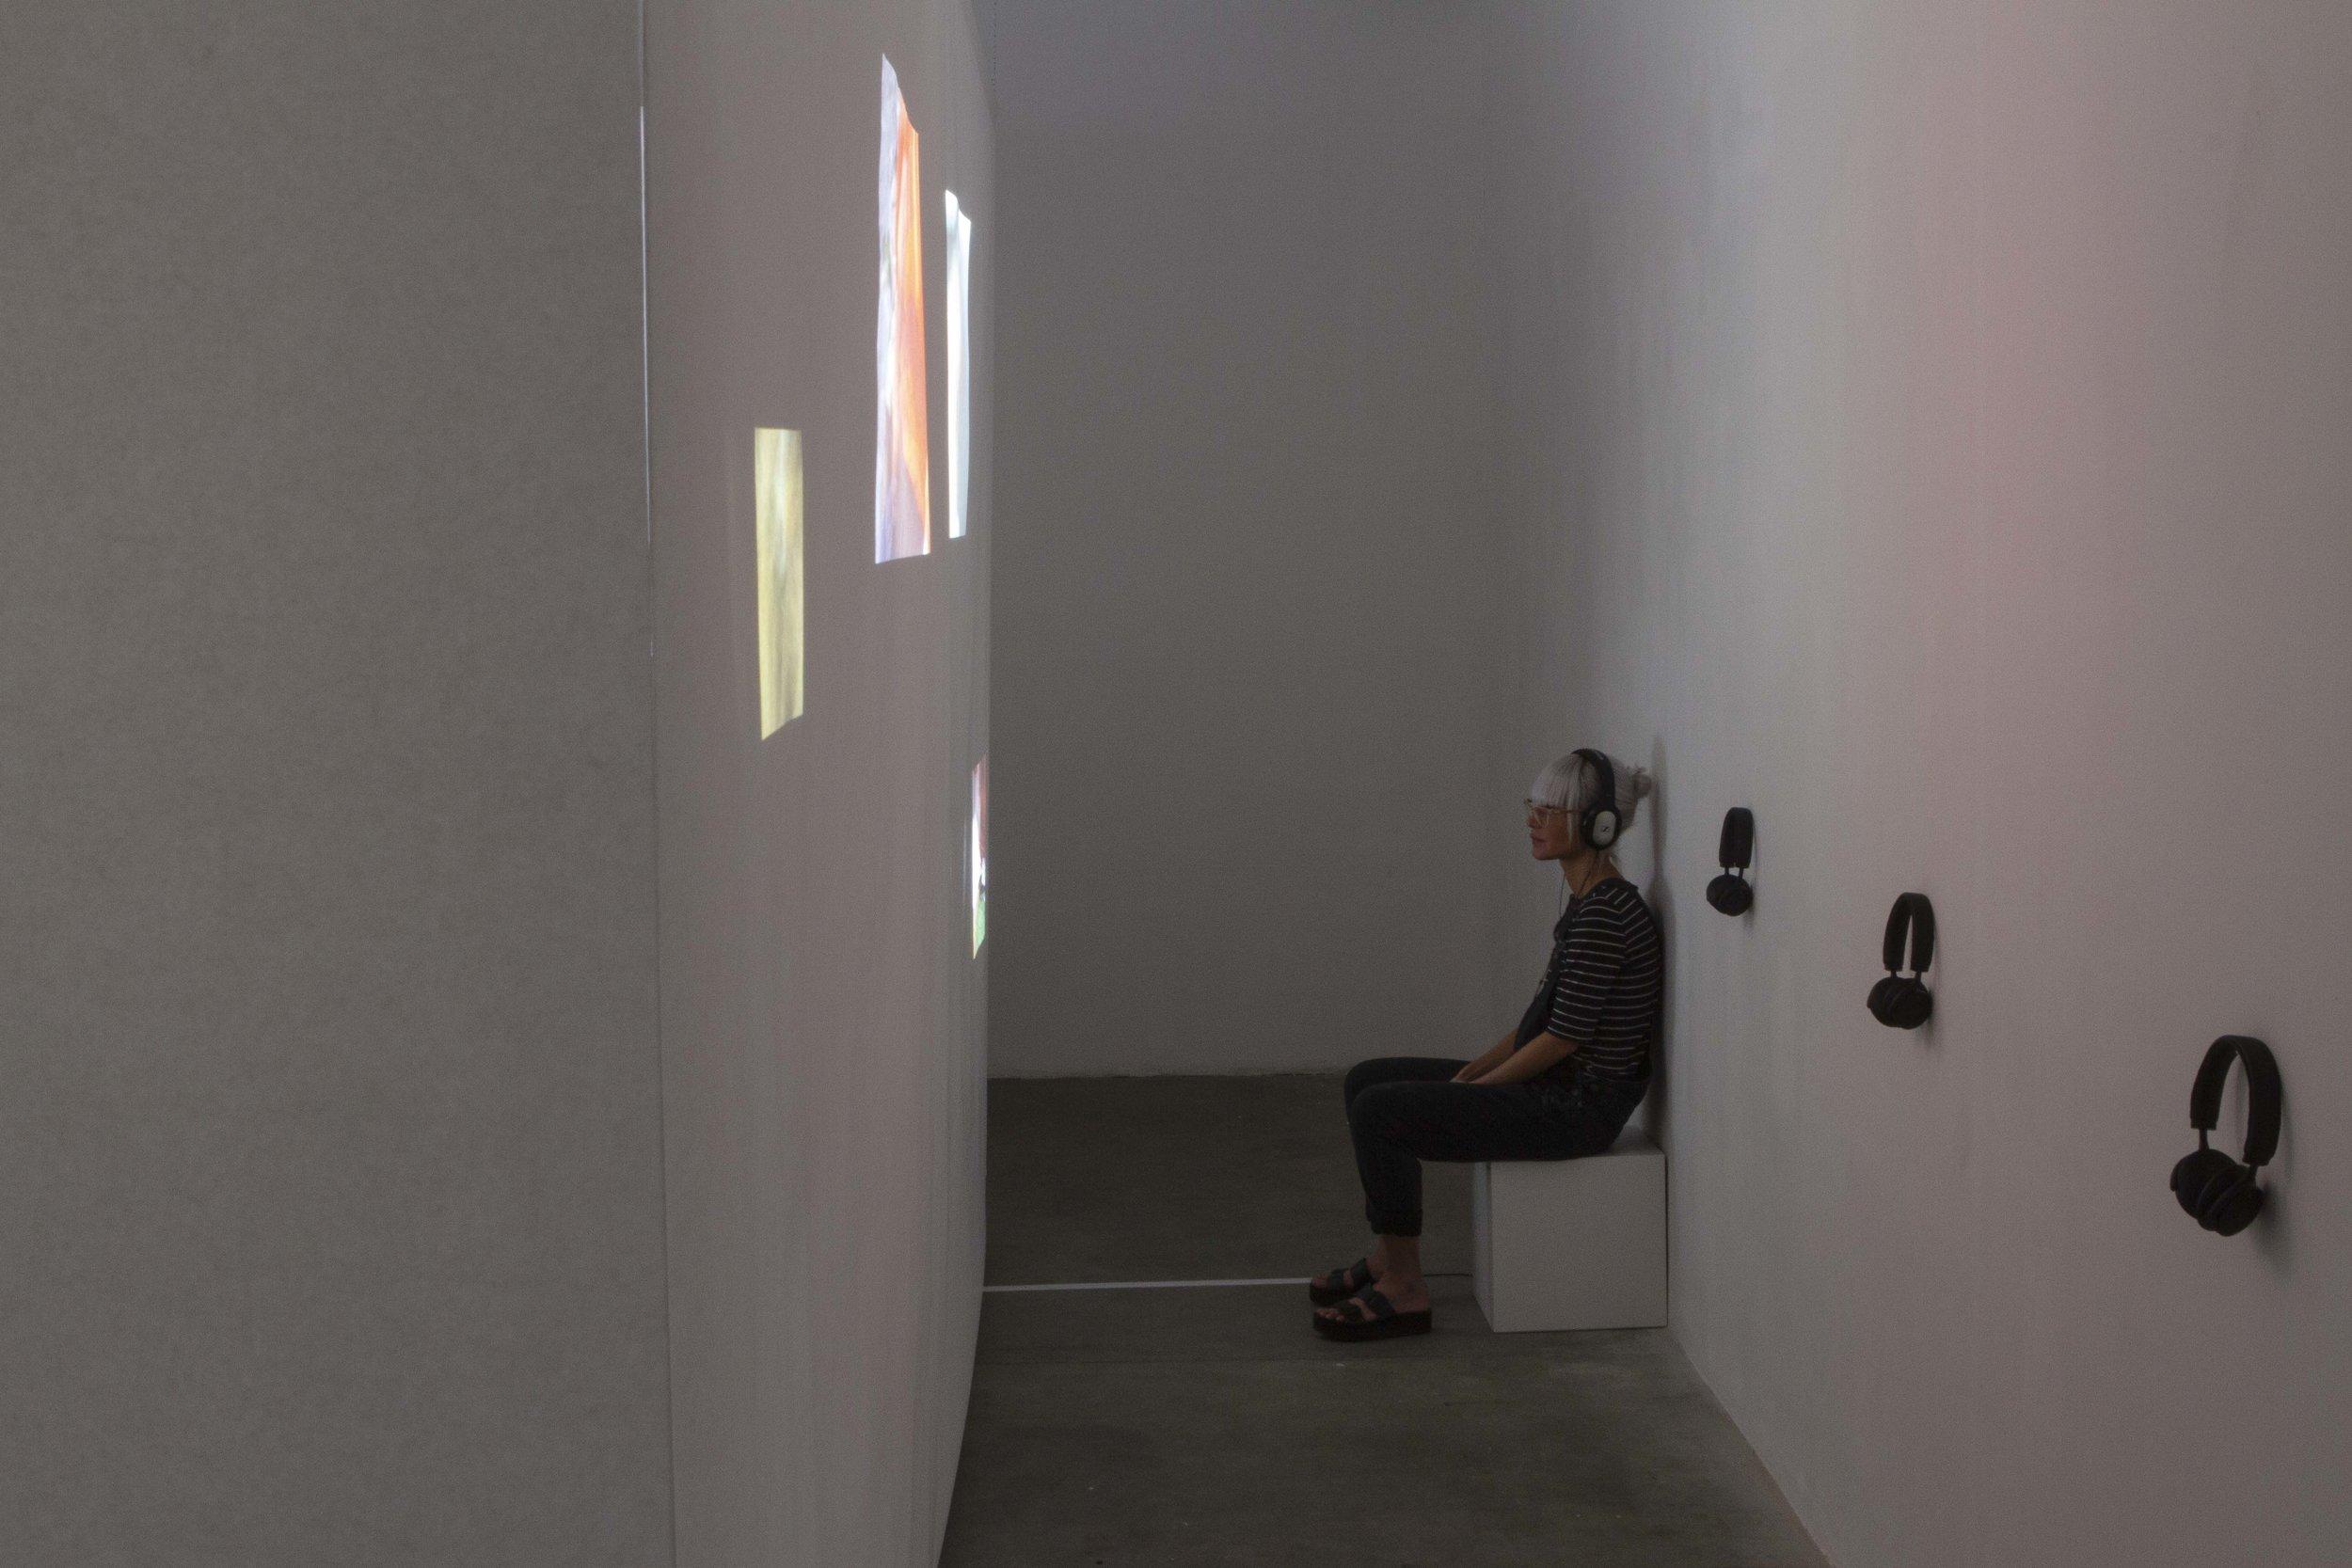 exhibition - a video installation named objet regard, Ateliers de Bellevaux, Lausanne, 2019